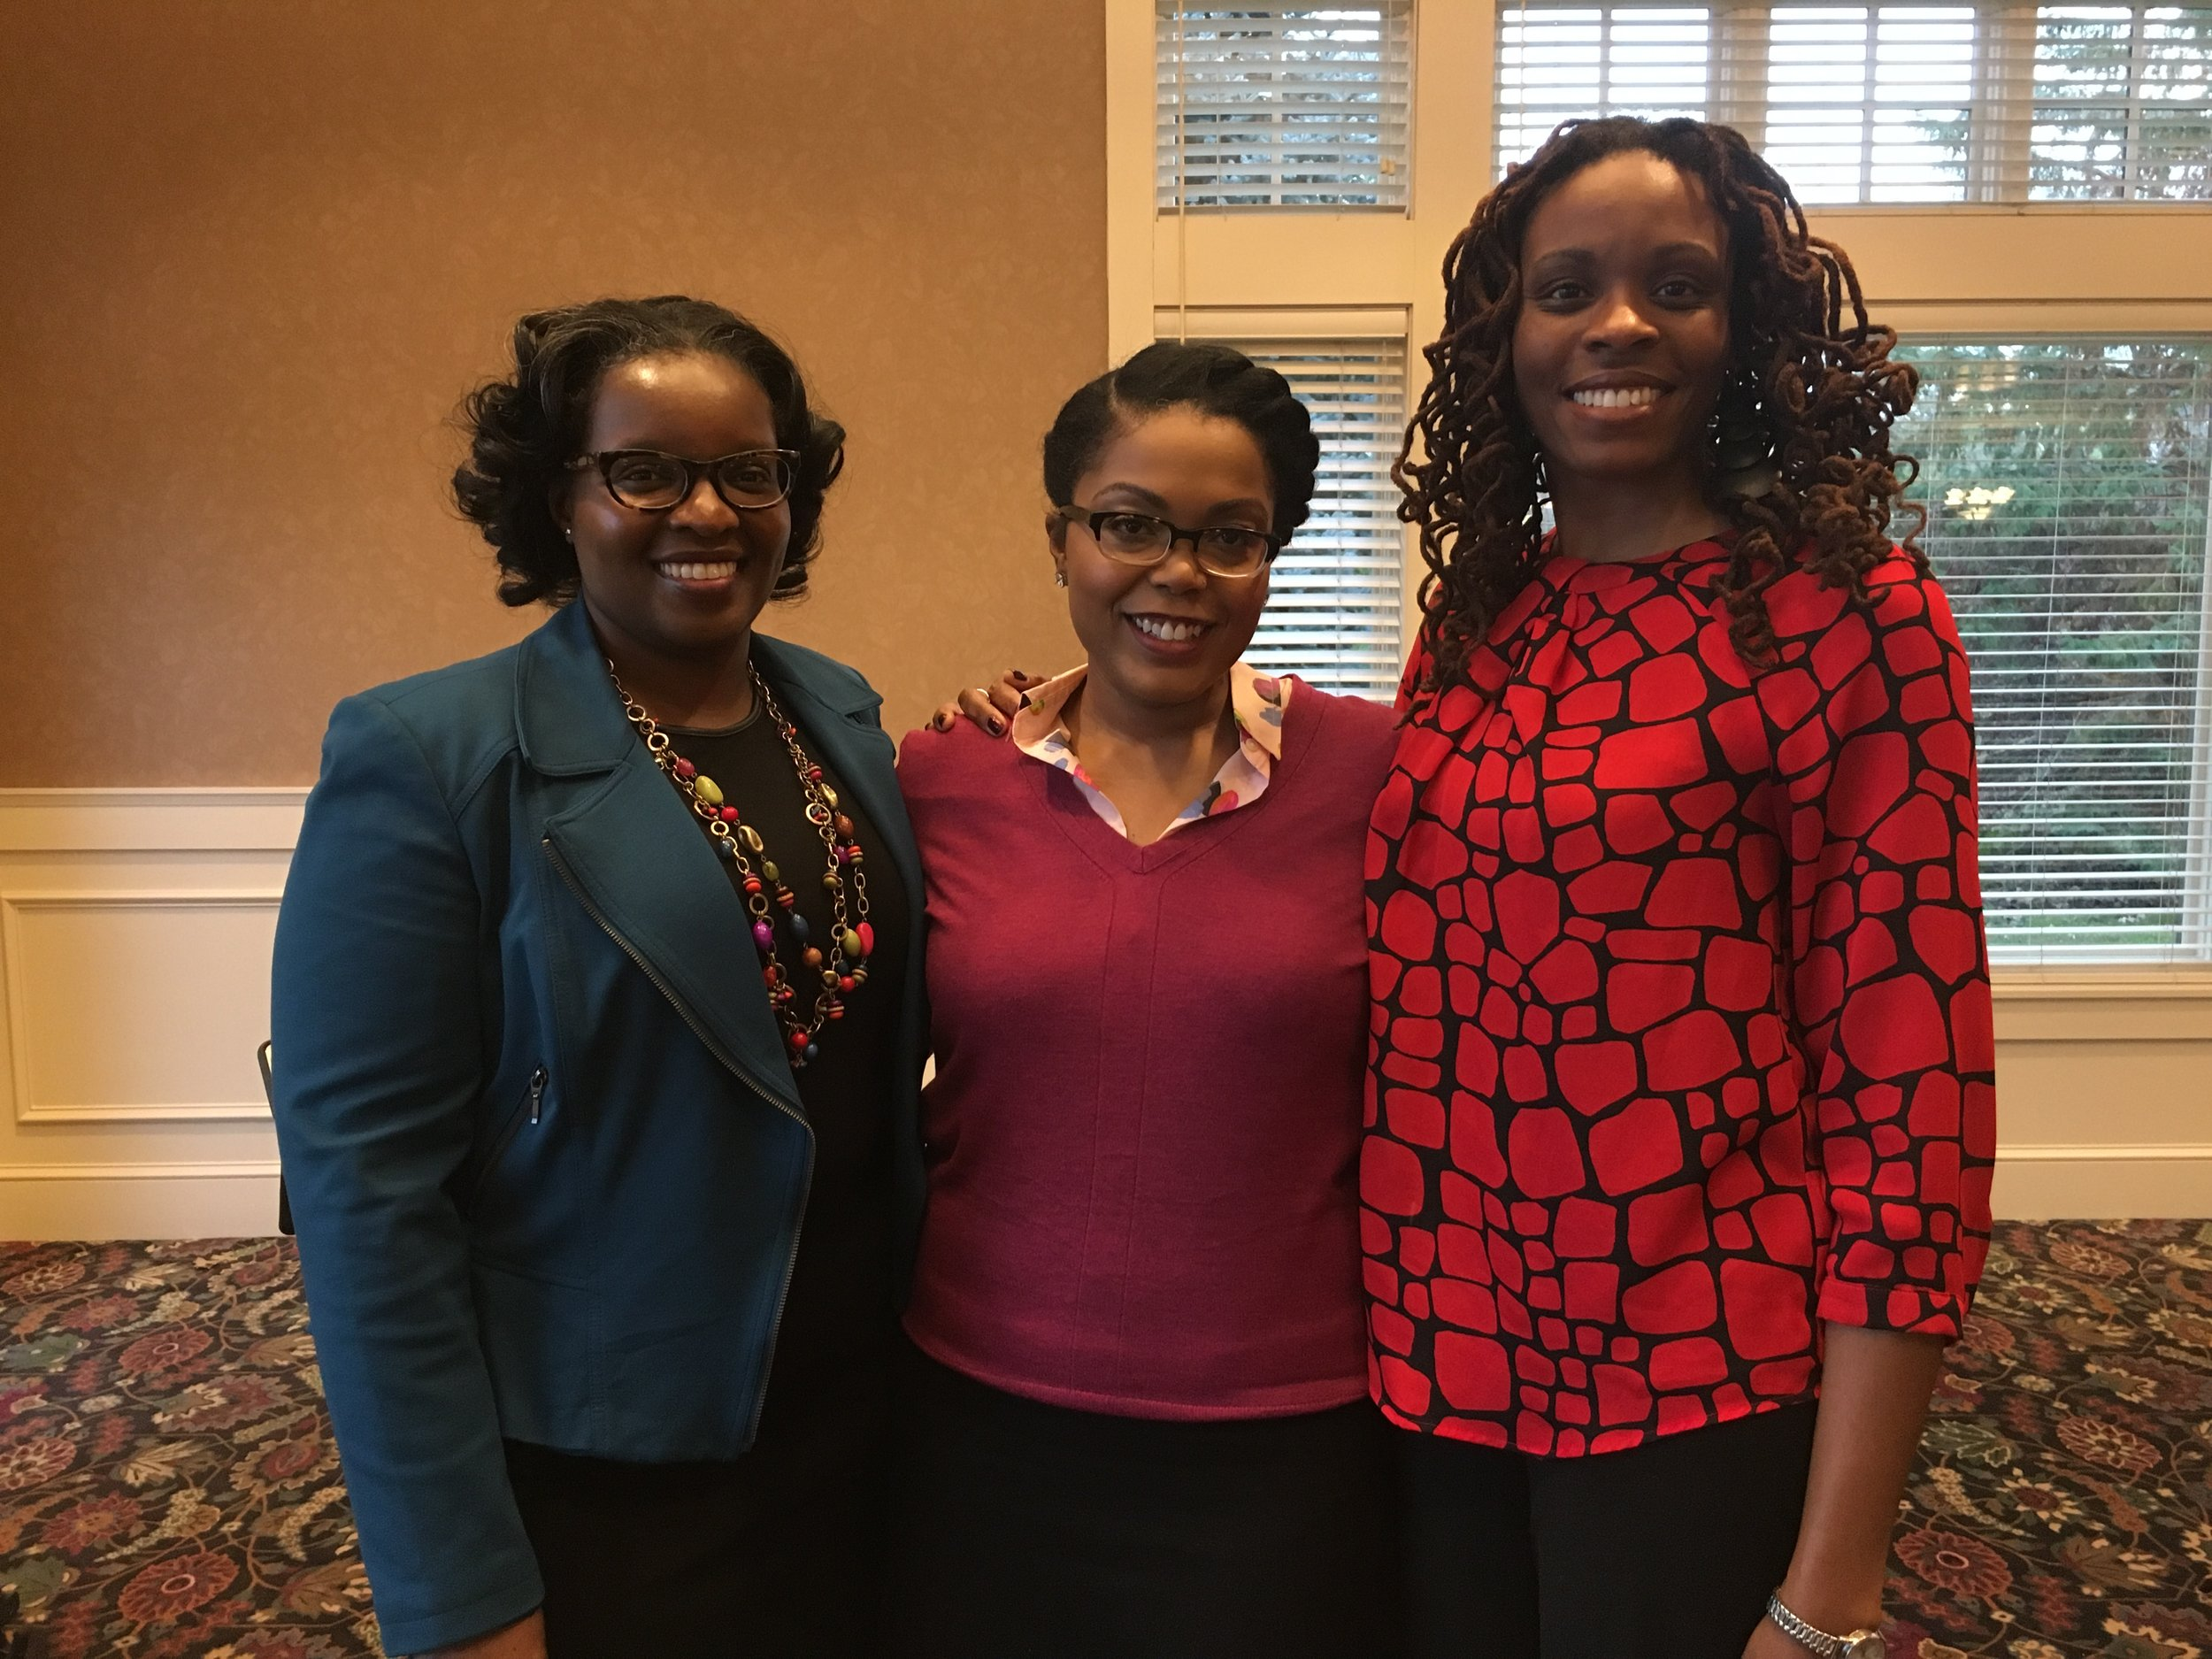 Sherellia Moore, keynote speaker Acooa Ellis, and Theresa Living Center board member Karla Benson Rutten.